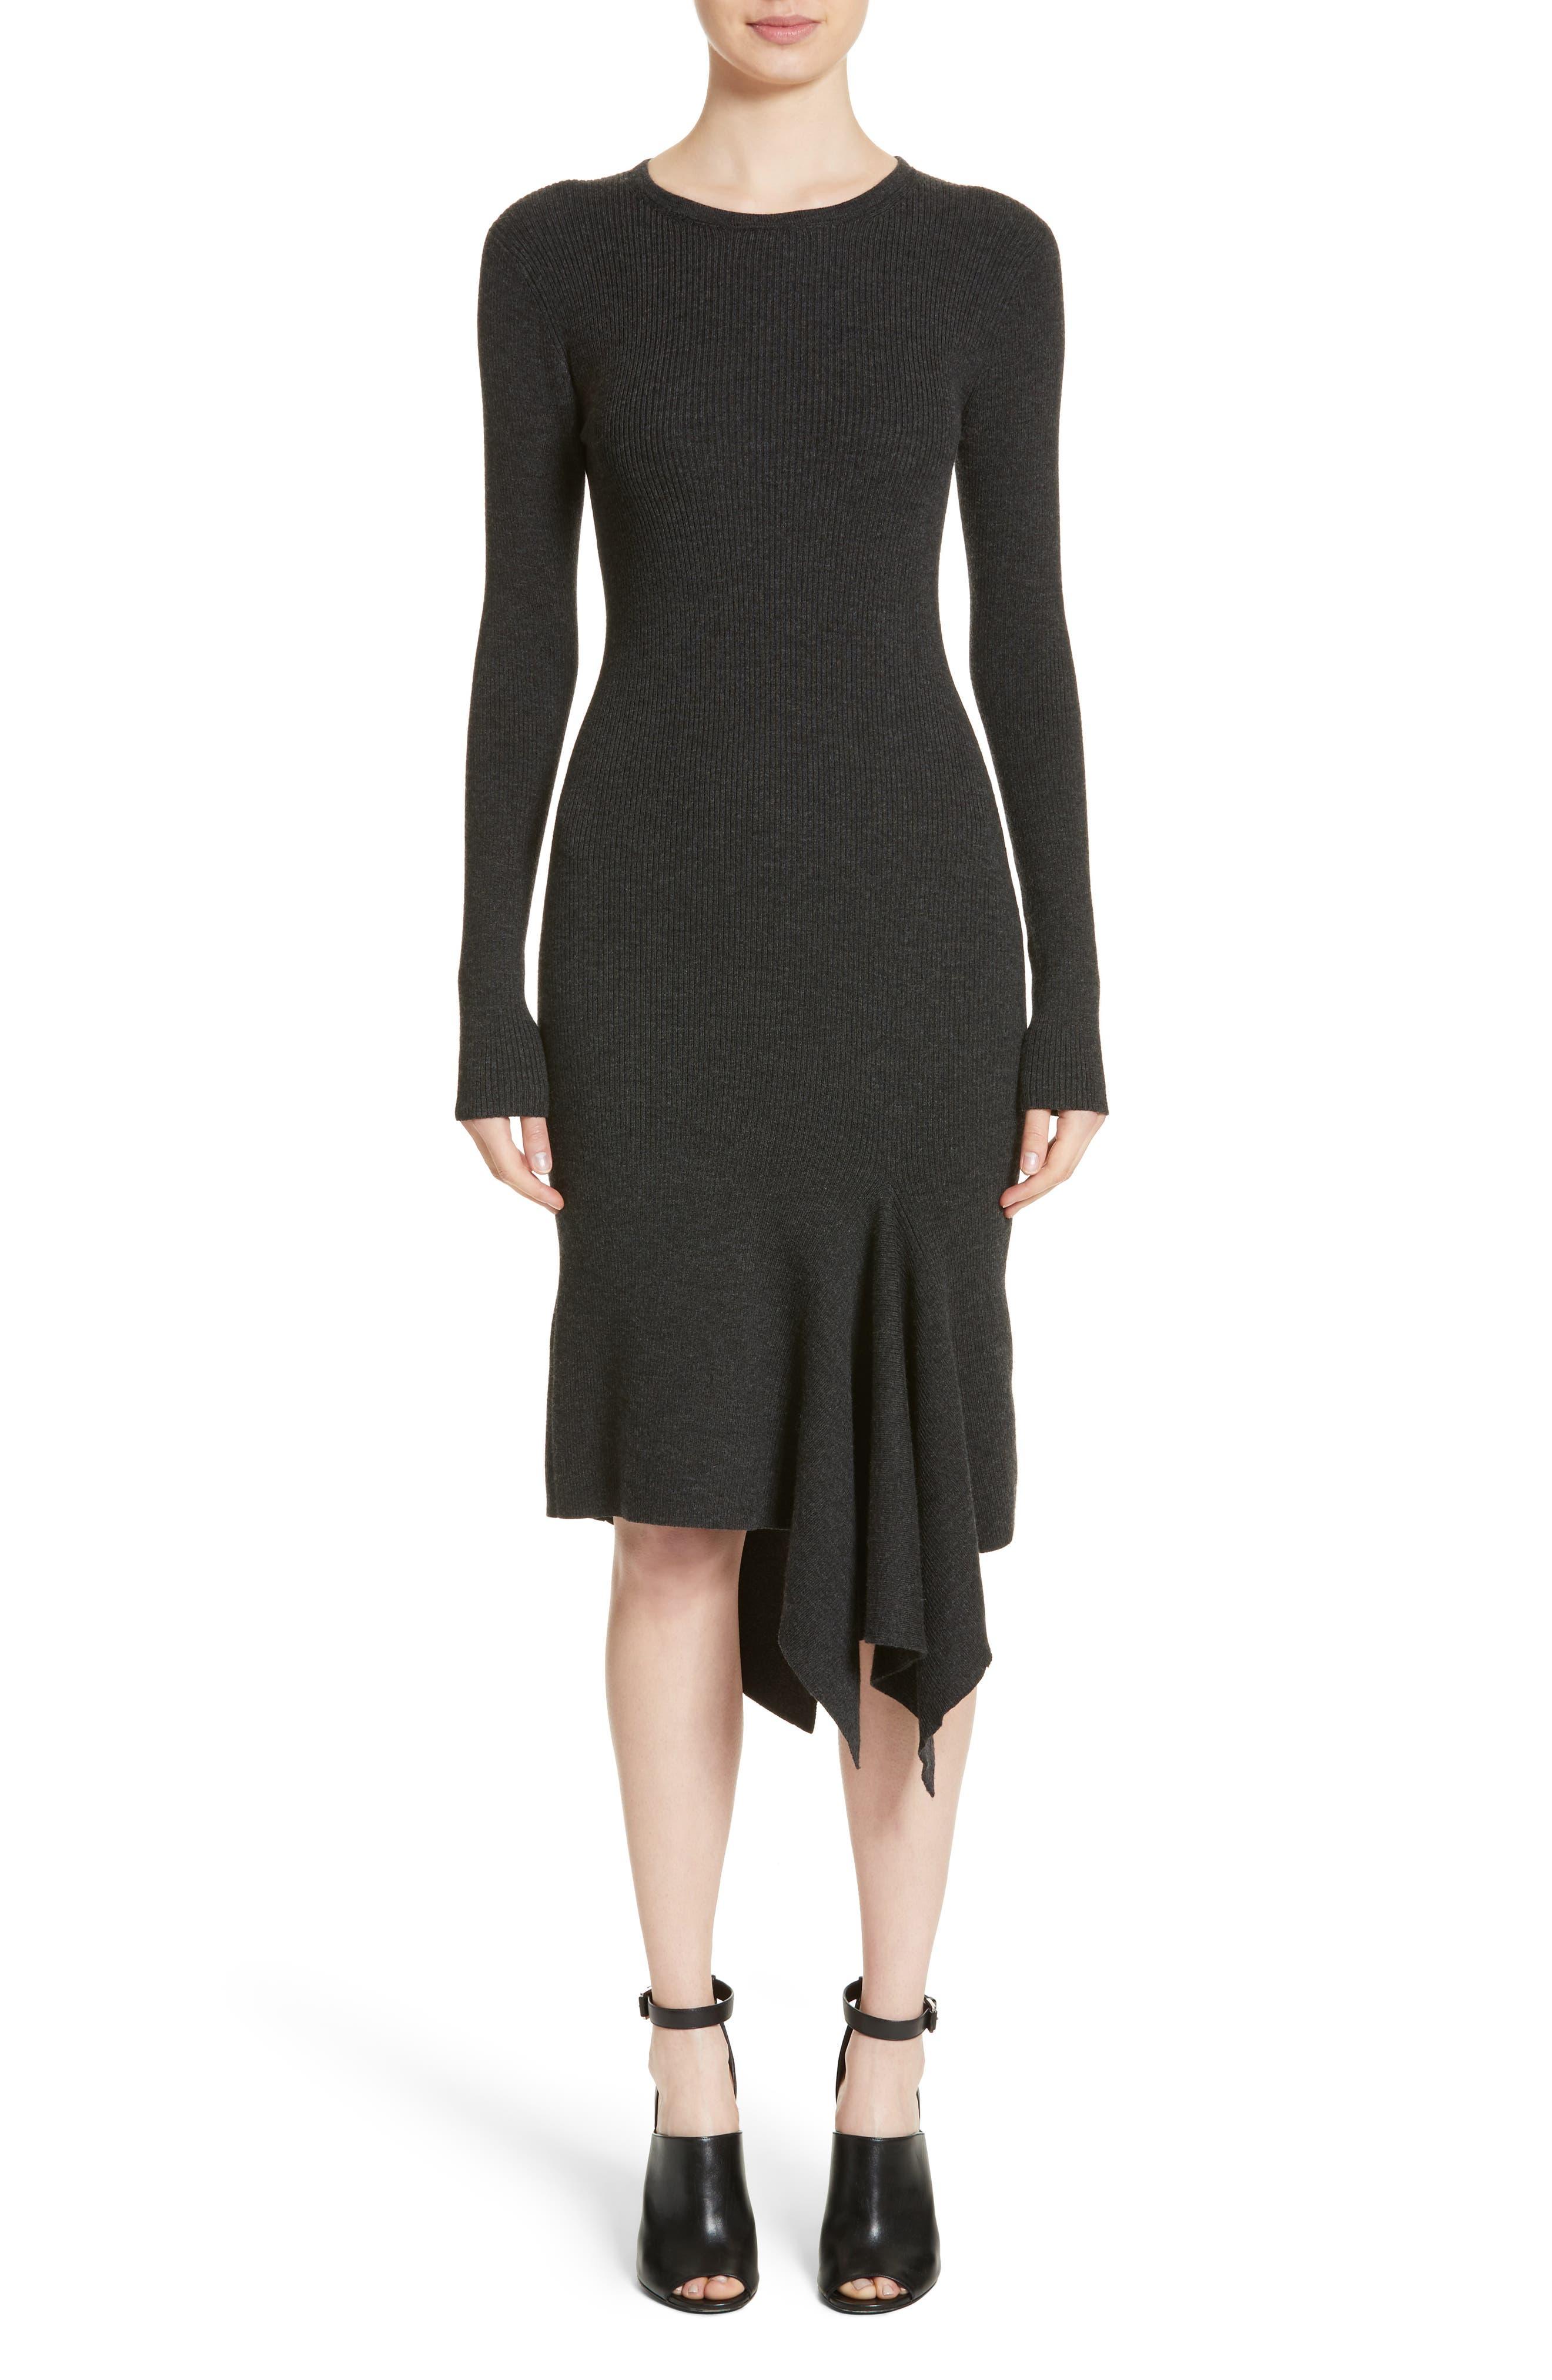 Michael Kors Merino Wool Blend Handkerchief Hem Dress